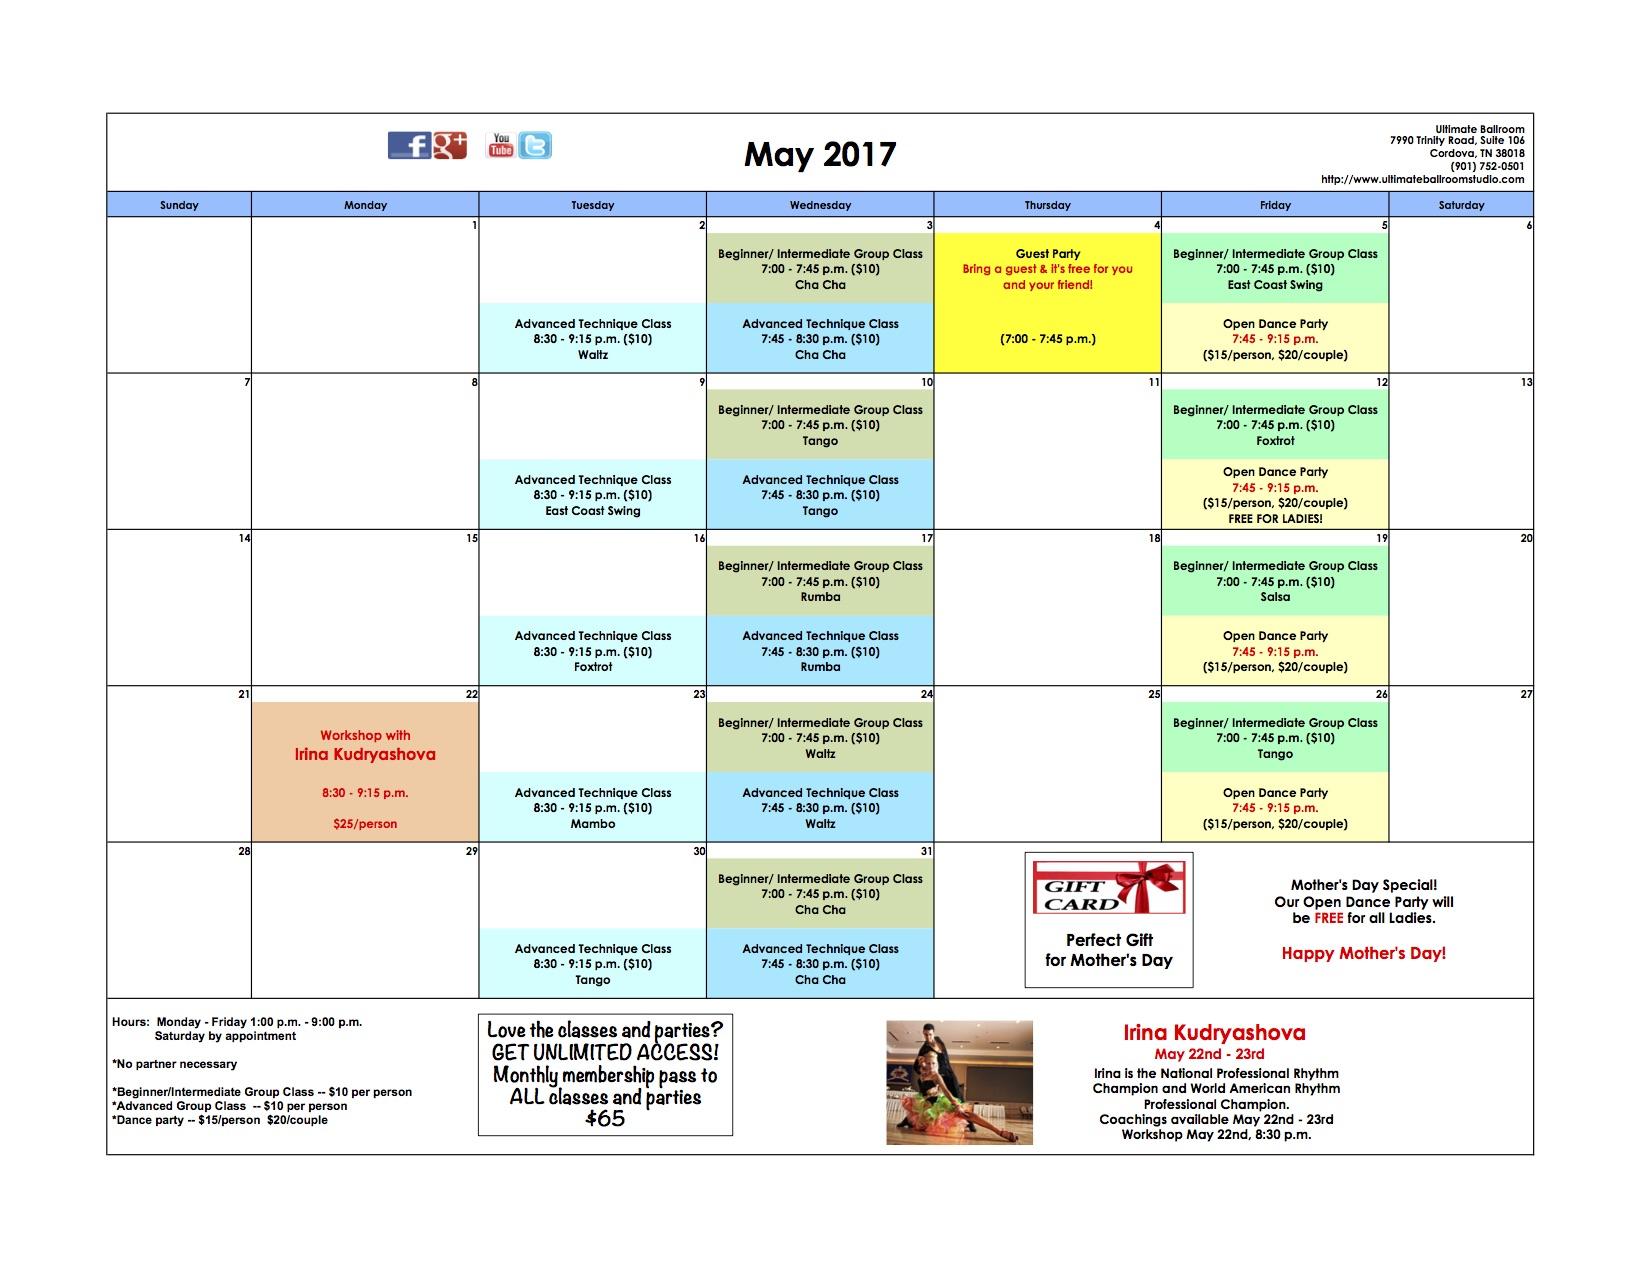 Events Calendar - May 2017 - Ultimate Ballroom